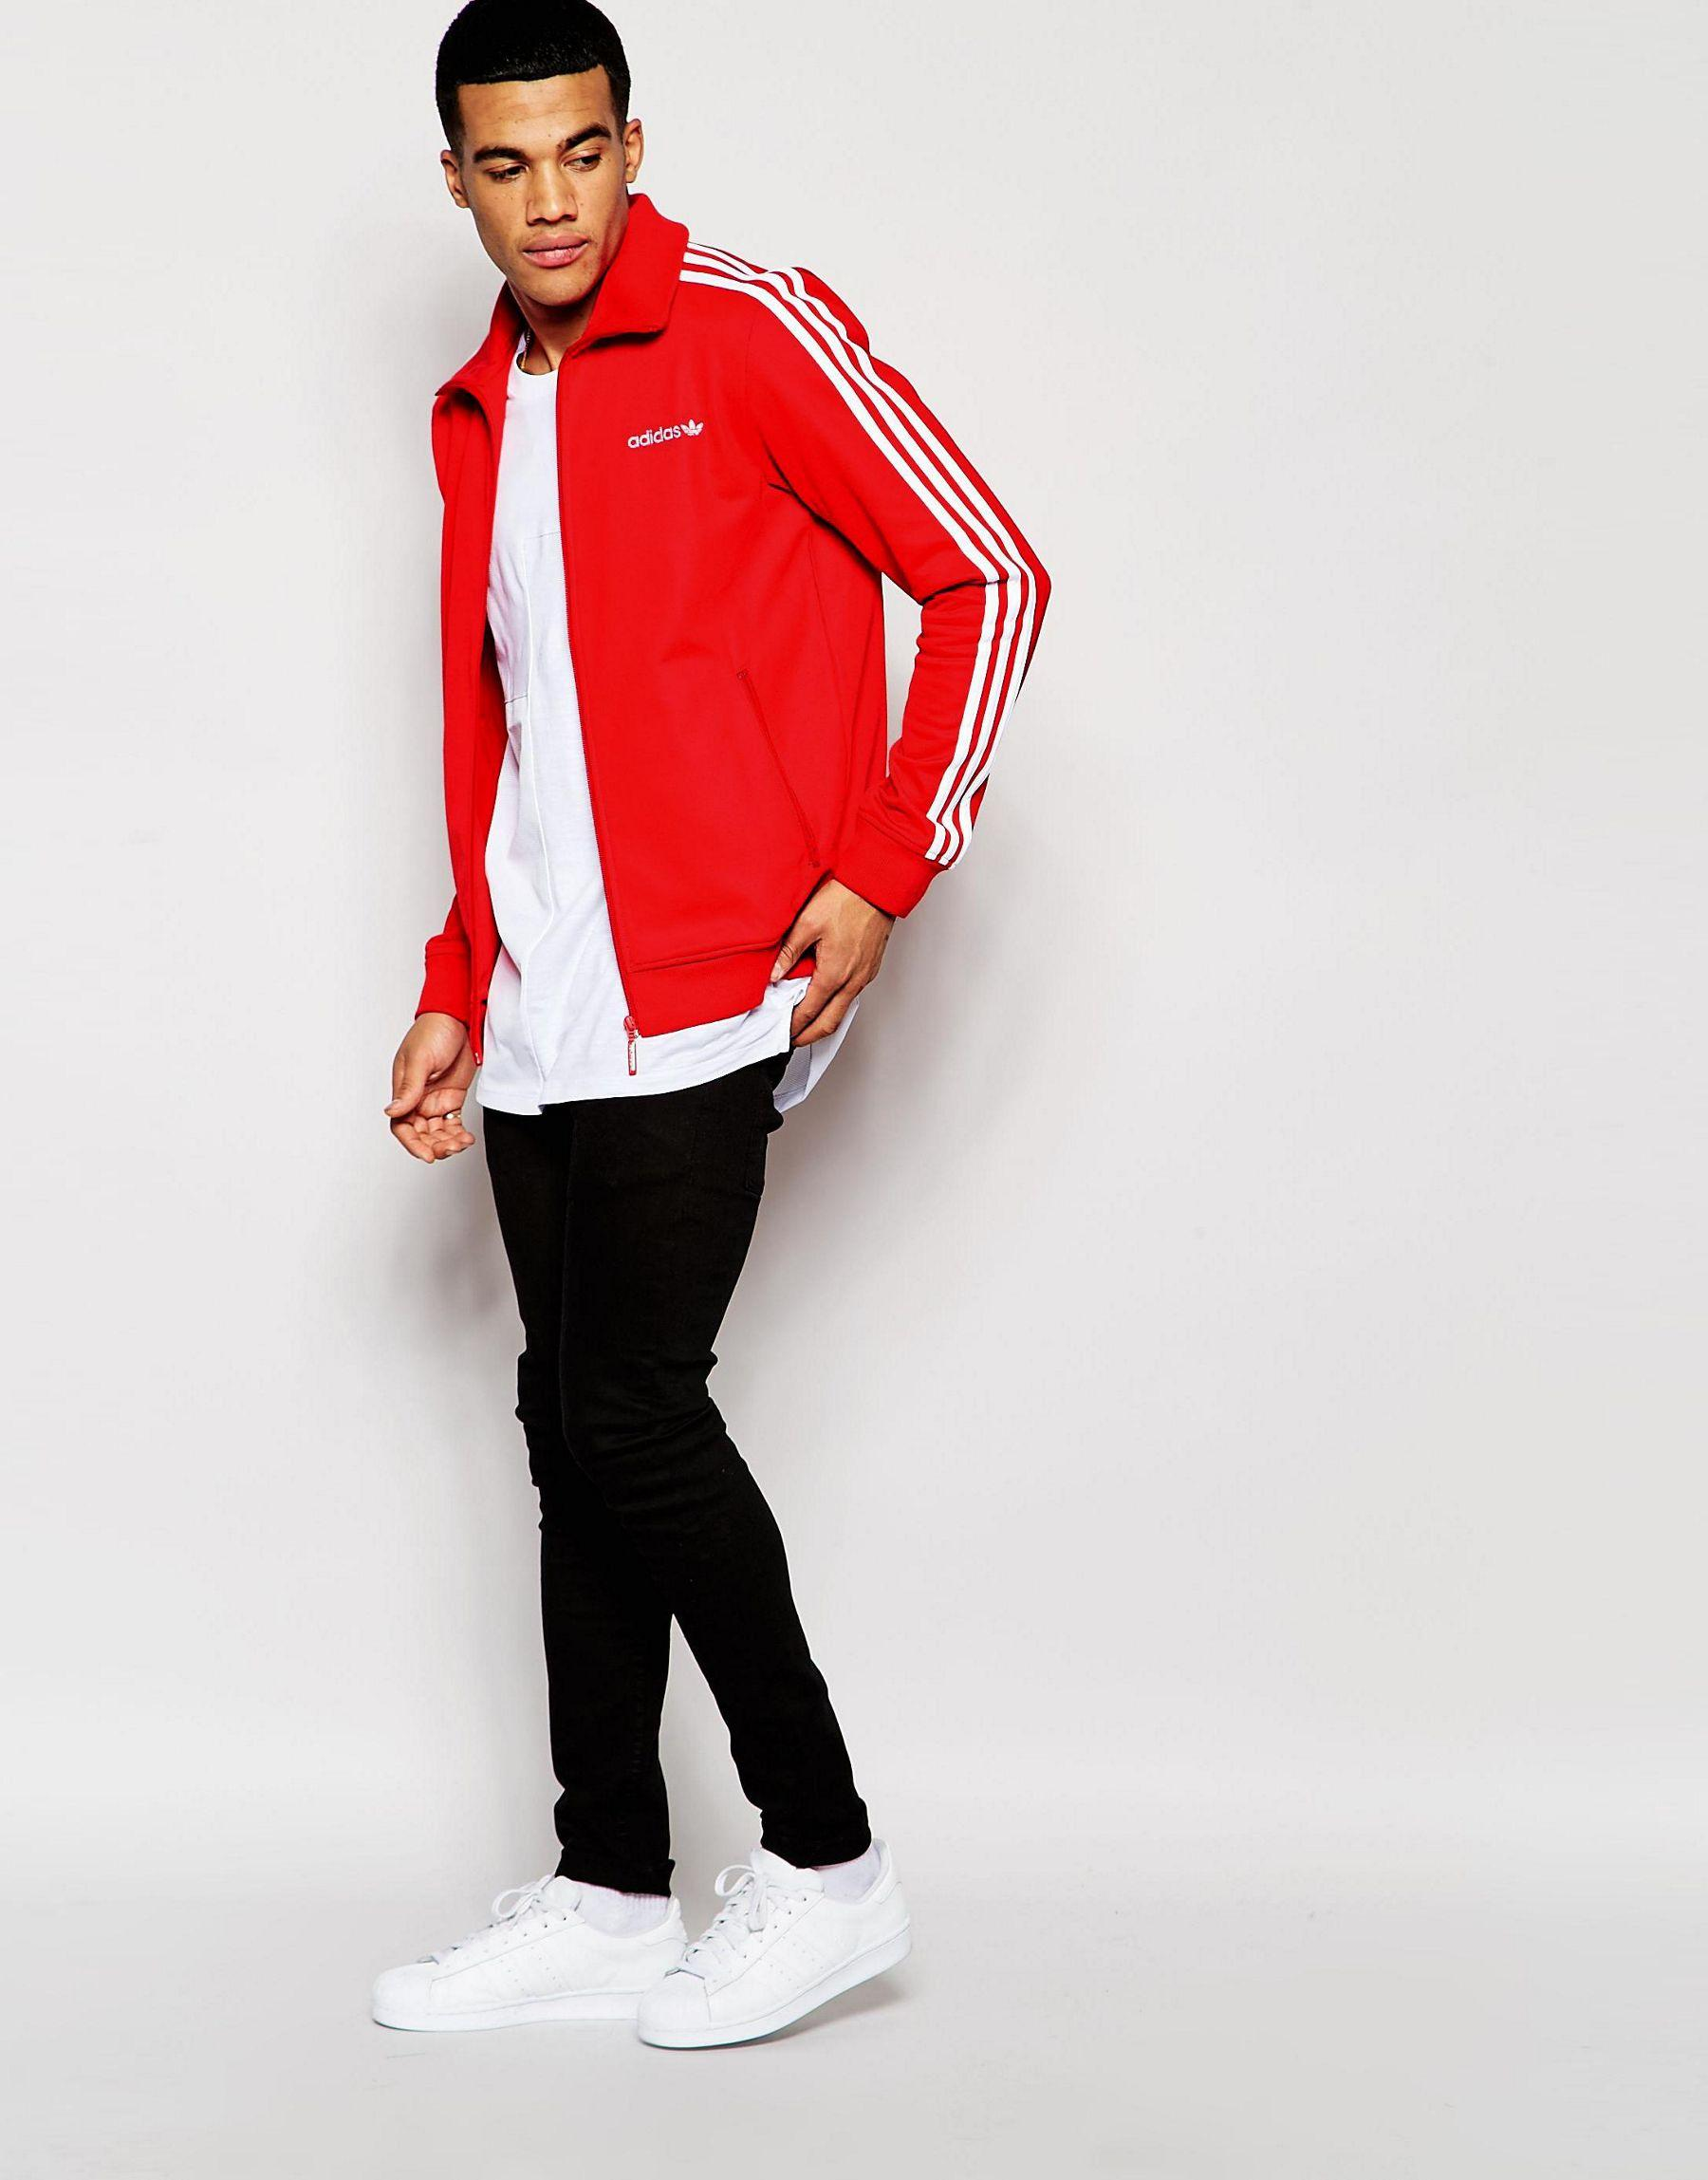 Lyst - adidas Originals Beckenbauer Track Jacket Aj6953 in Red for Men b87c06433